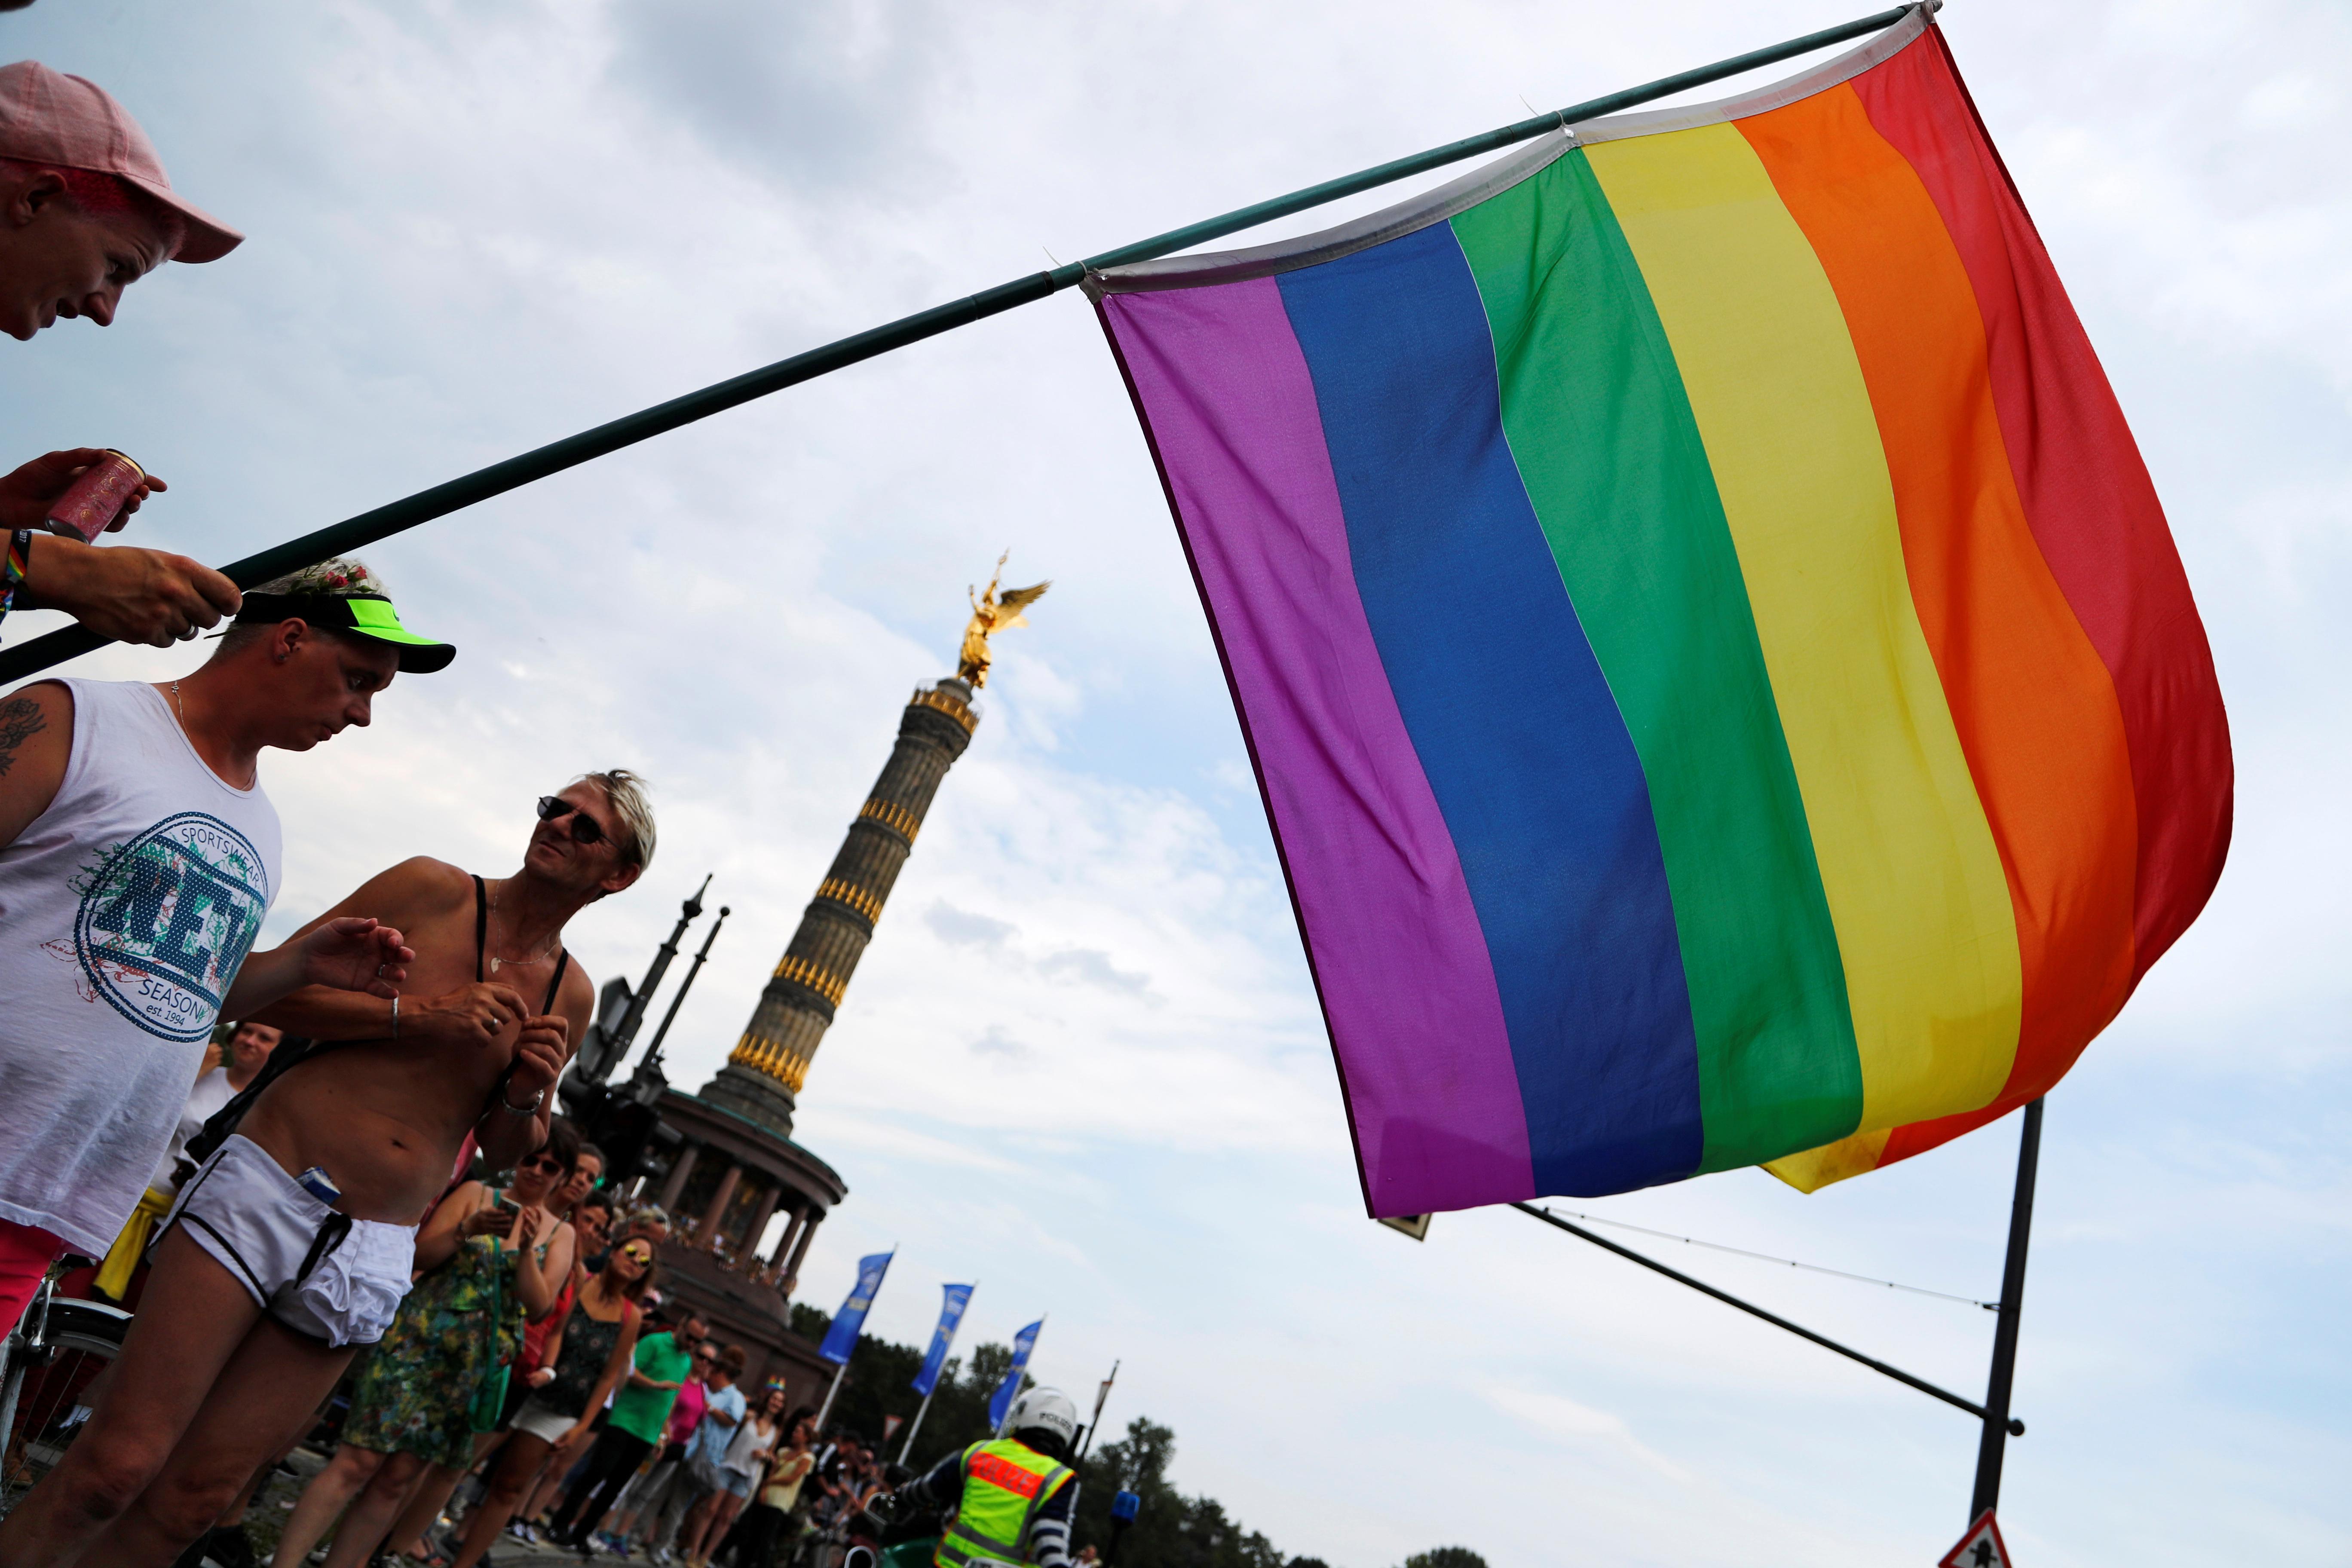 German parliament approves 'third gender' option